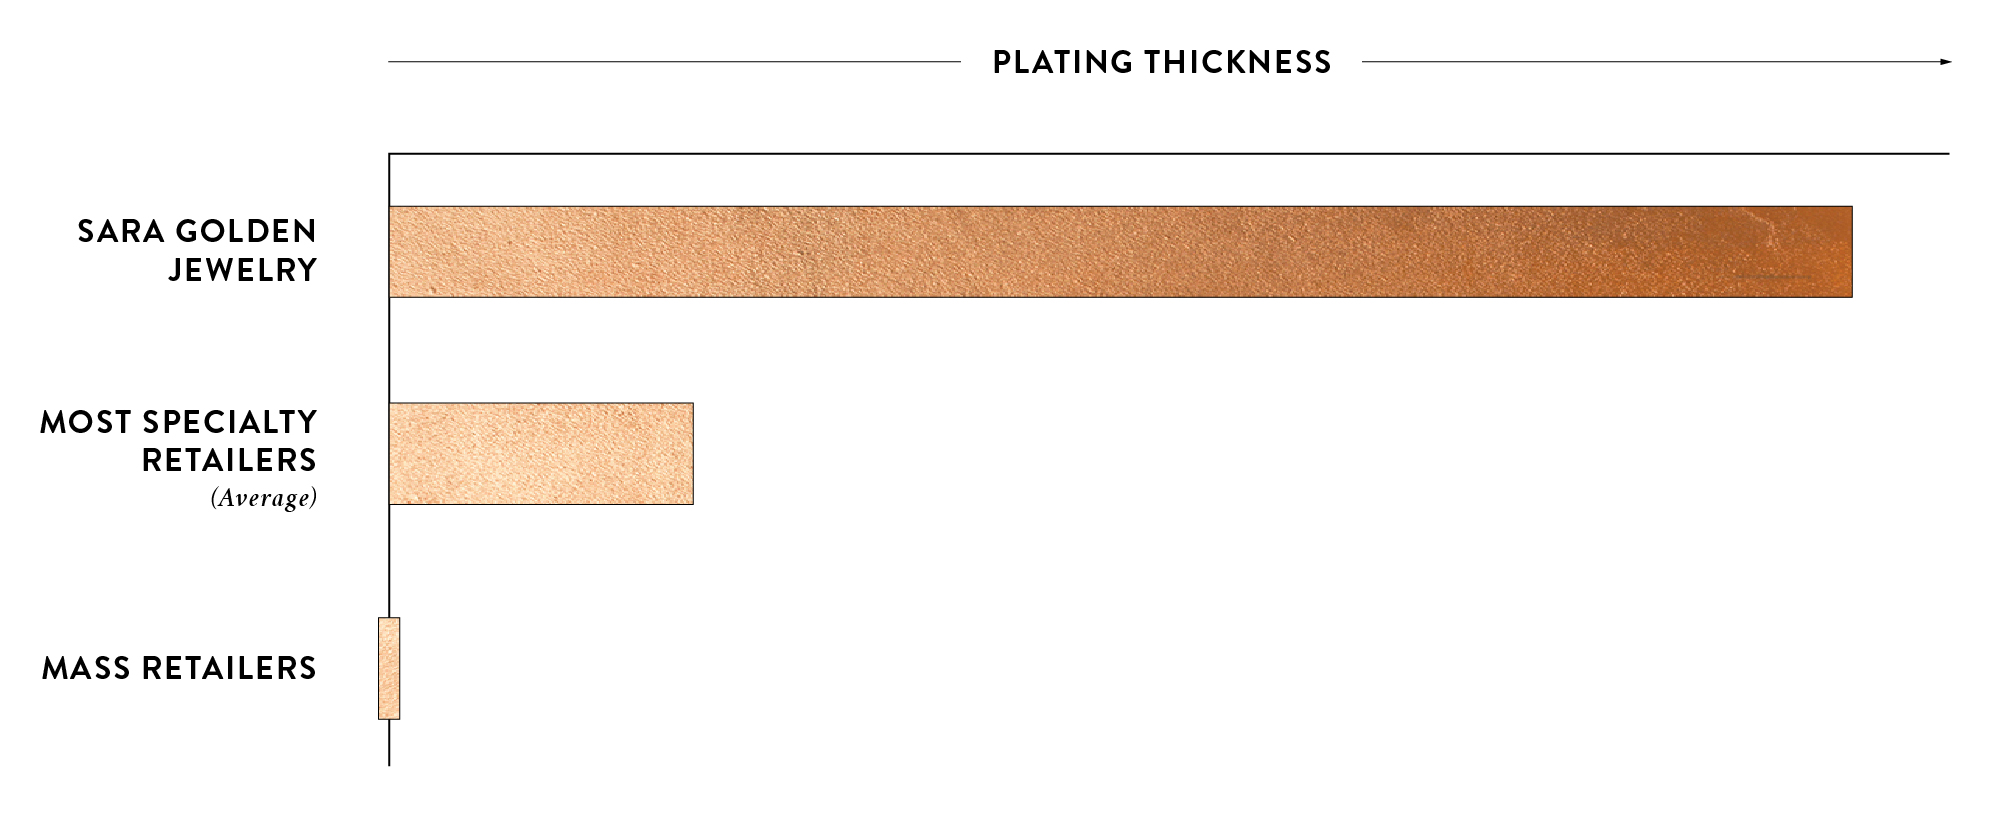 Gold plating thickness chart.jpg